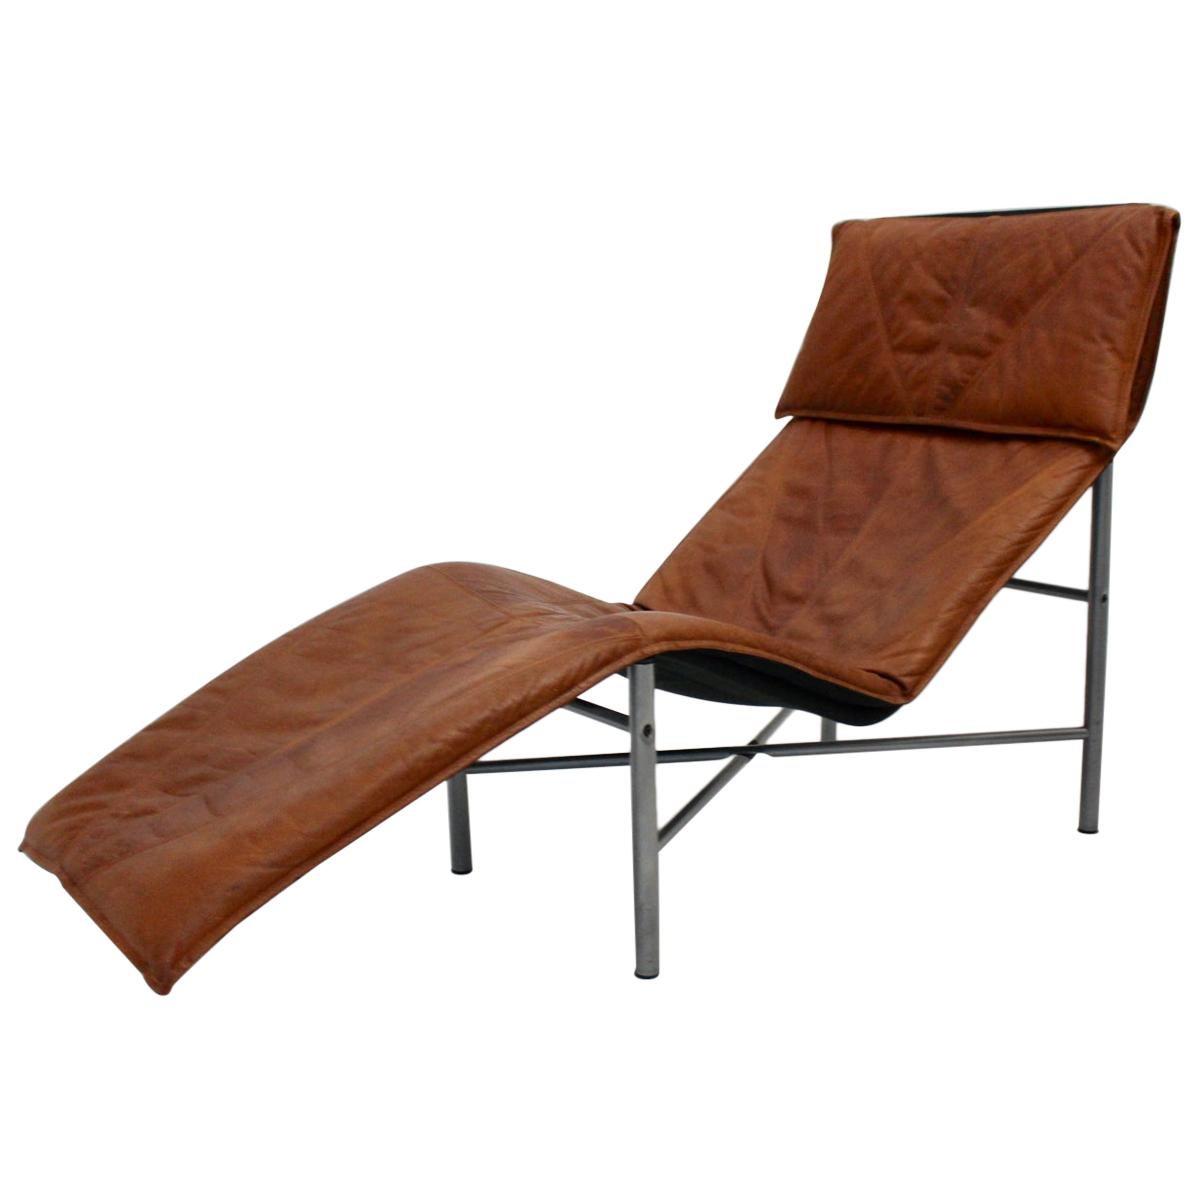 Vintage Cognac Leather Chaise Longue by Tord Bjorklund Sweden, 1970